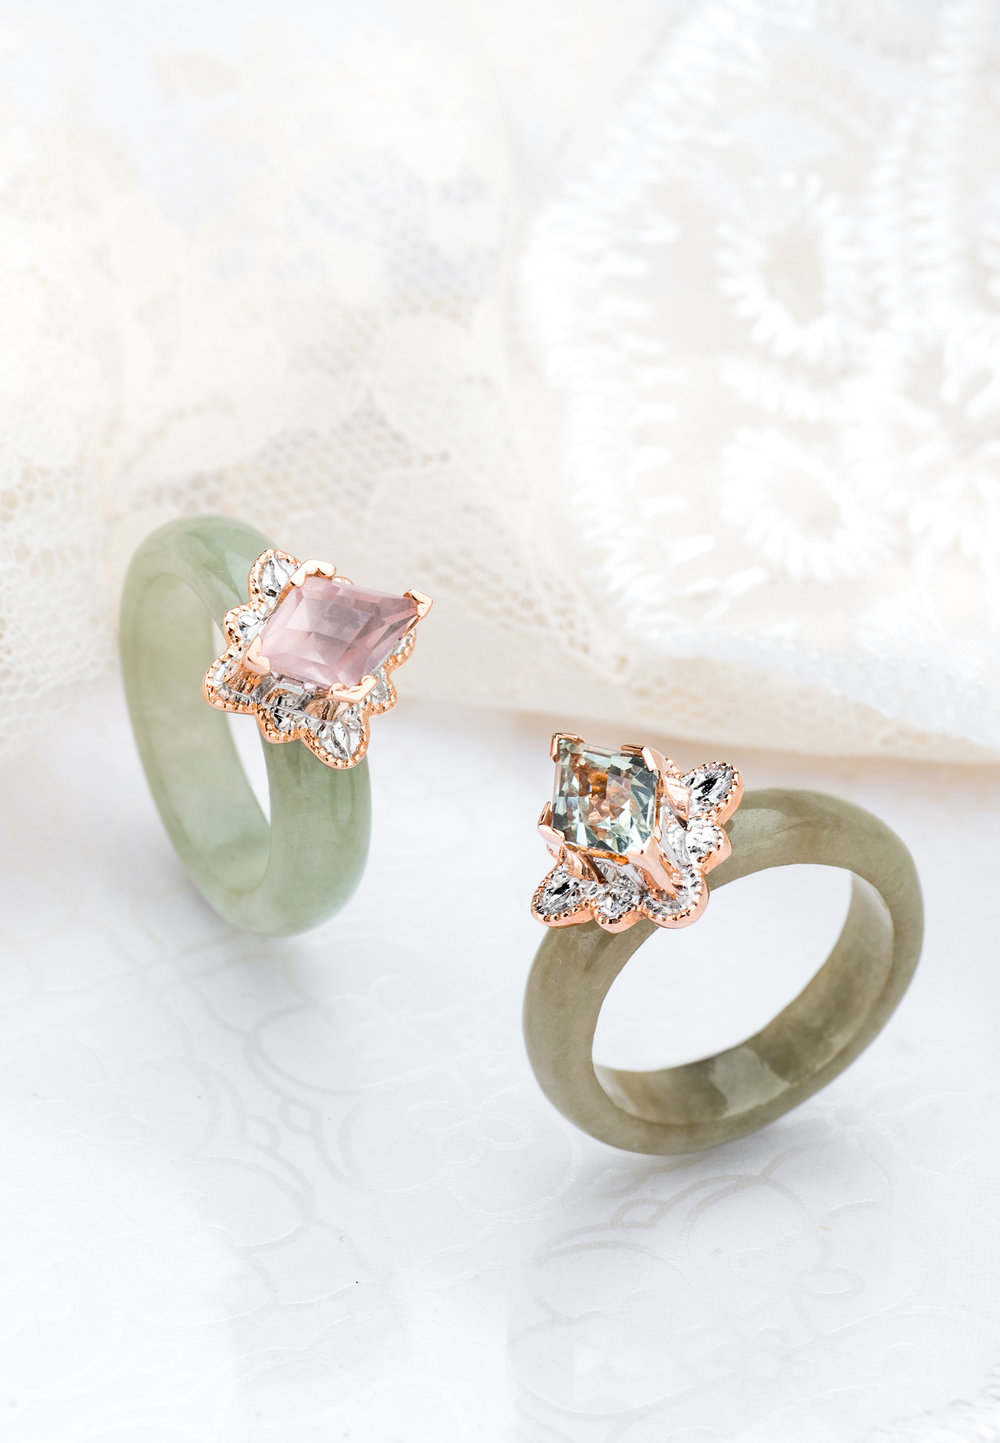 Choo Yilin Kebaya Gemstone Ring